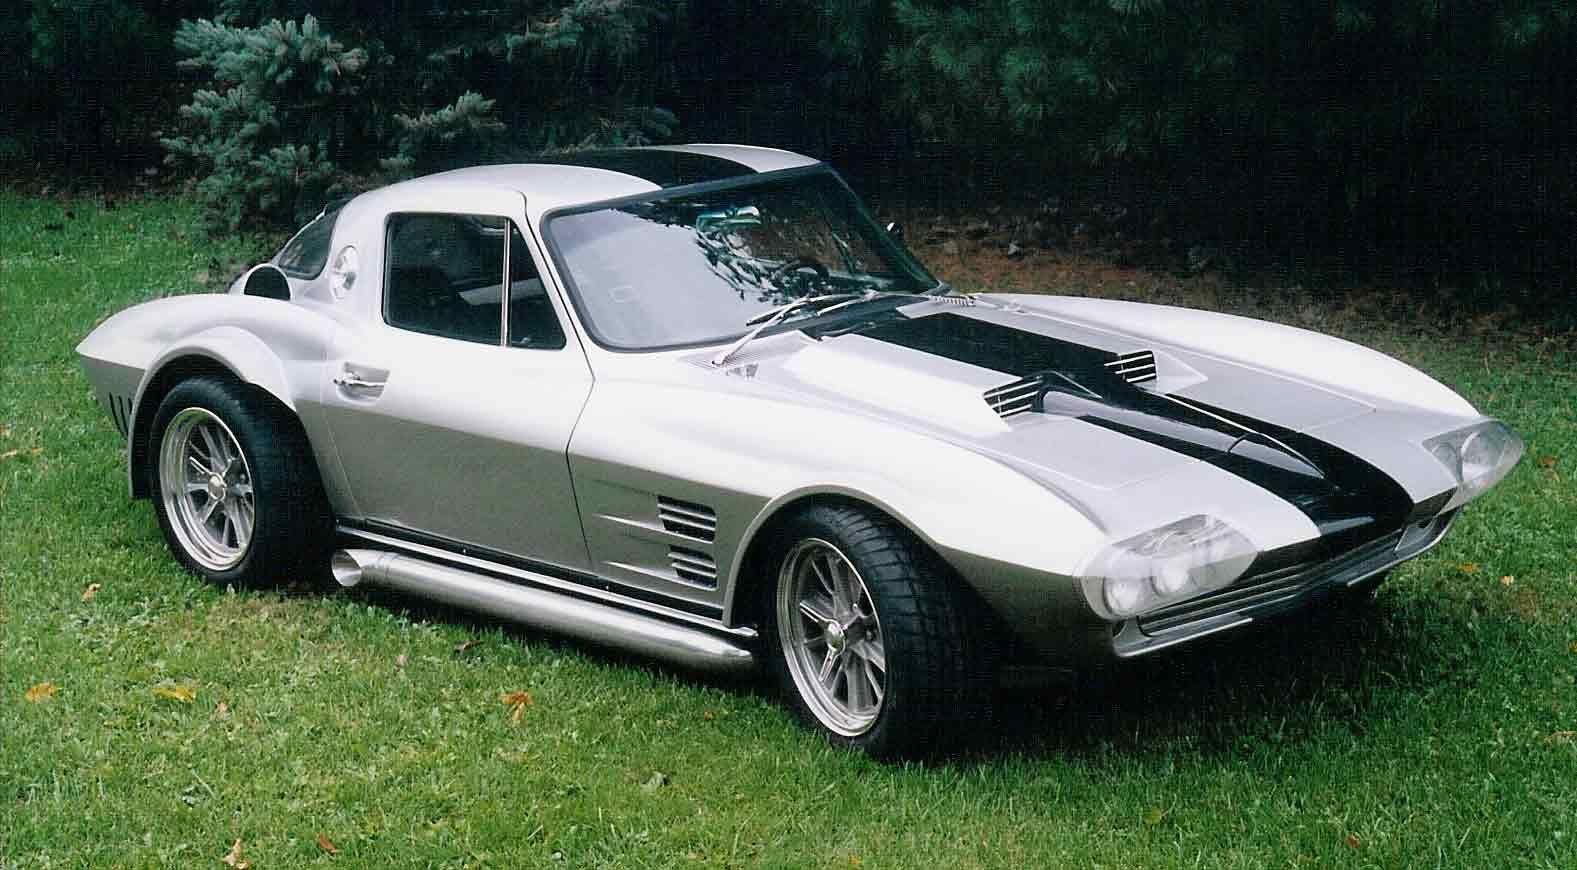 harry 39 s corvette kit car sale chevrolet corvette grand sport 1966 my corvettes pinterest. Black Bedroom Furniture Sets. Home Design Ideas